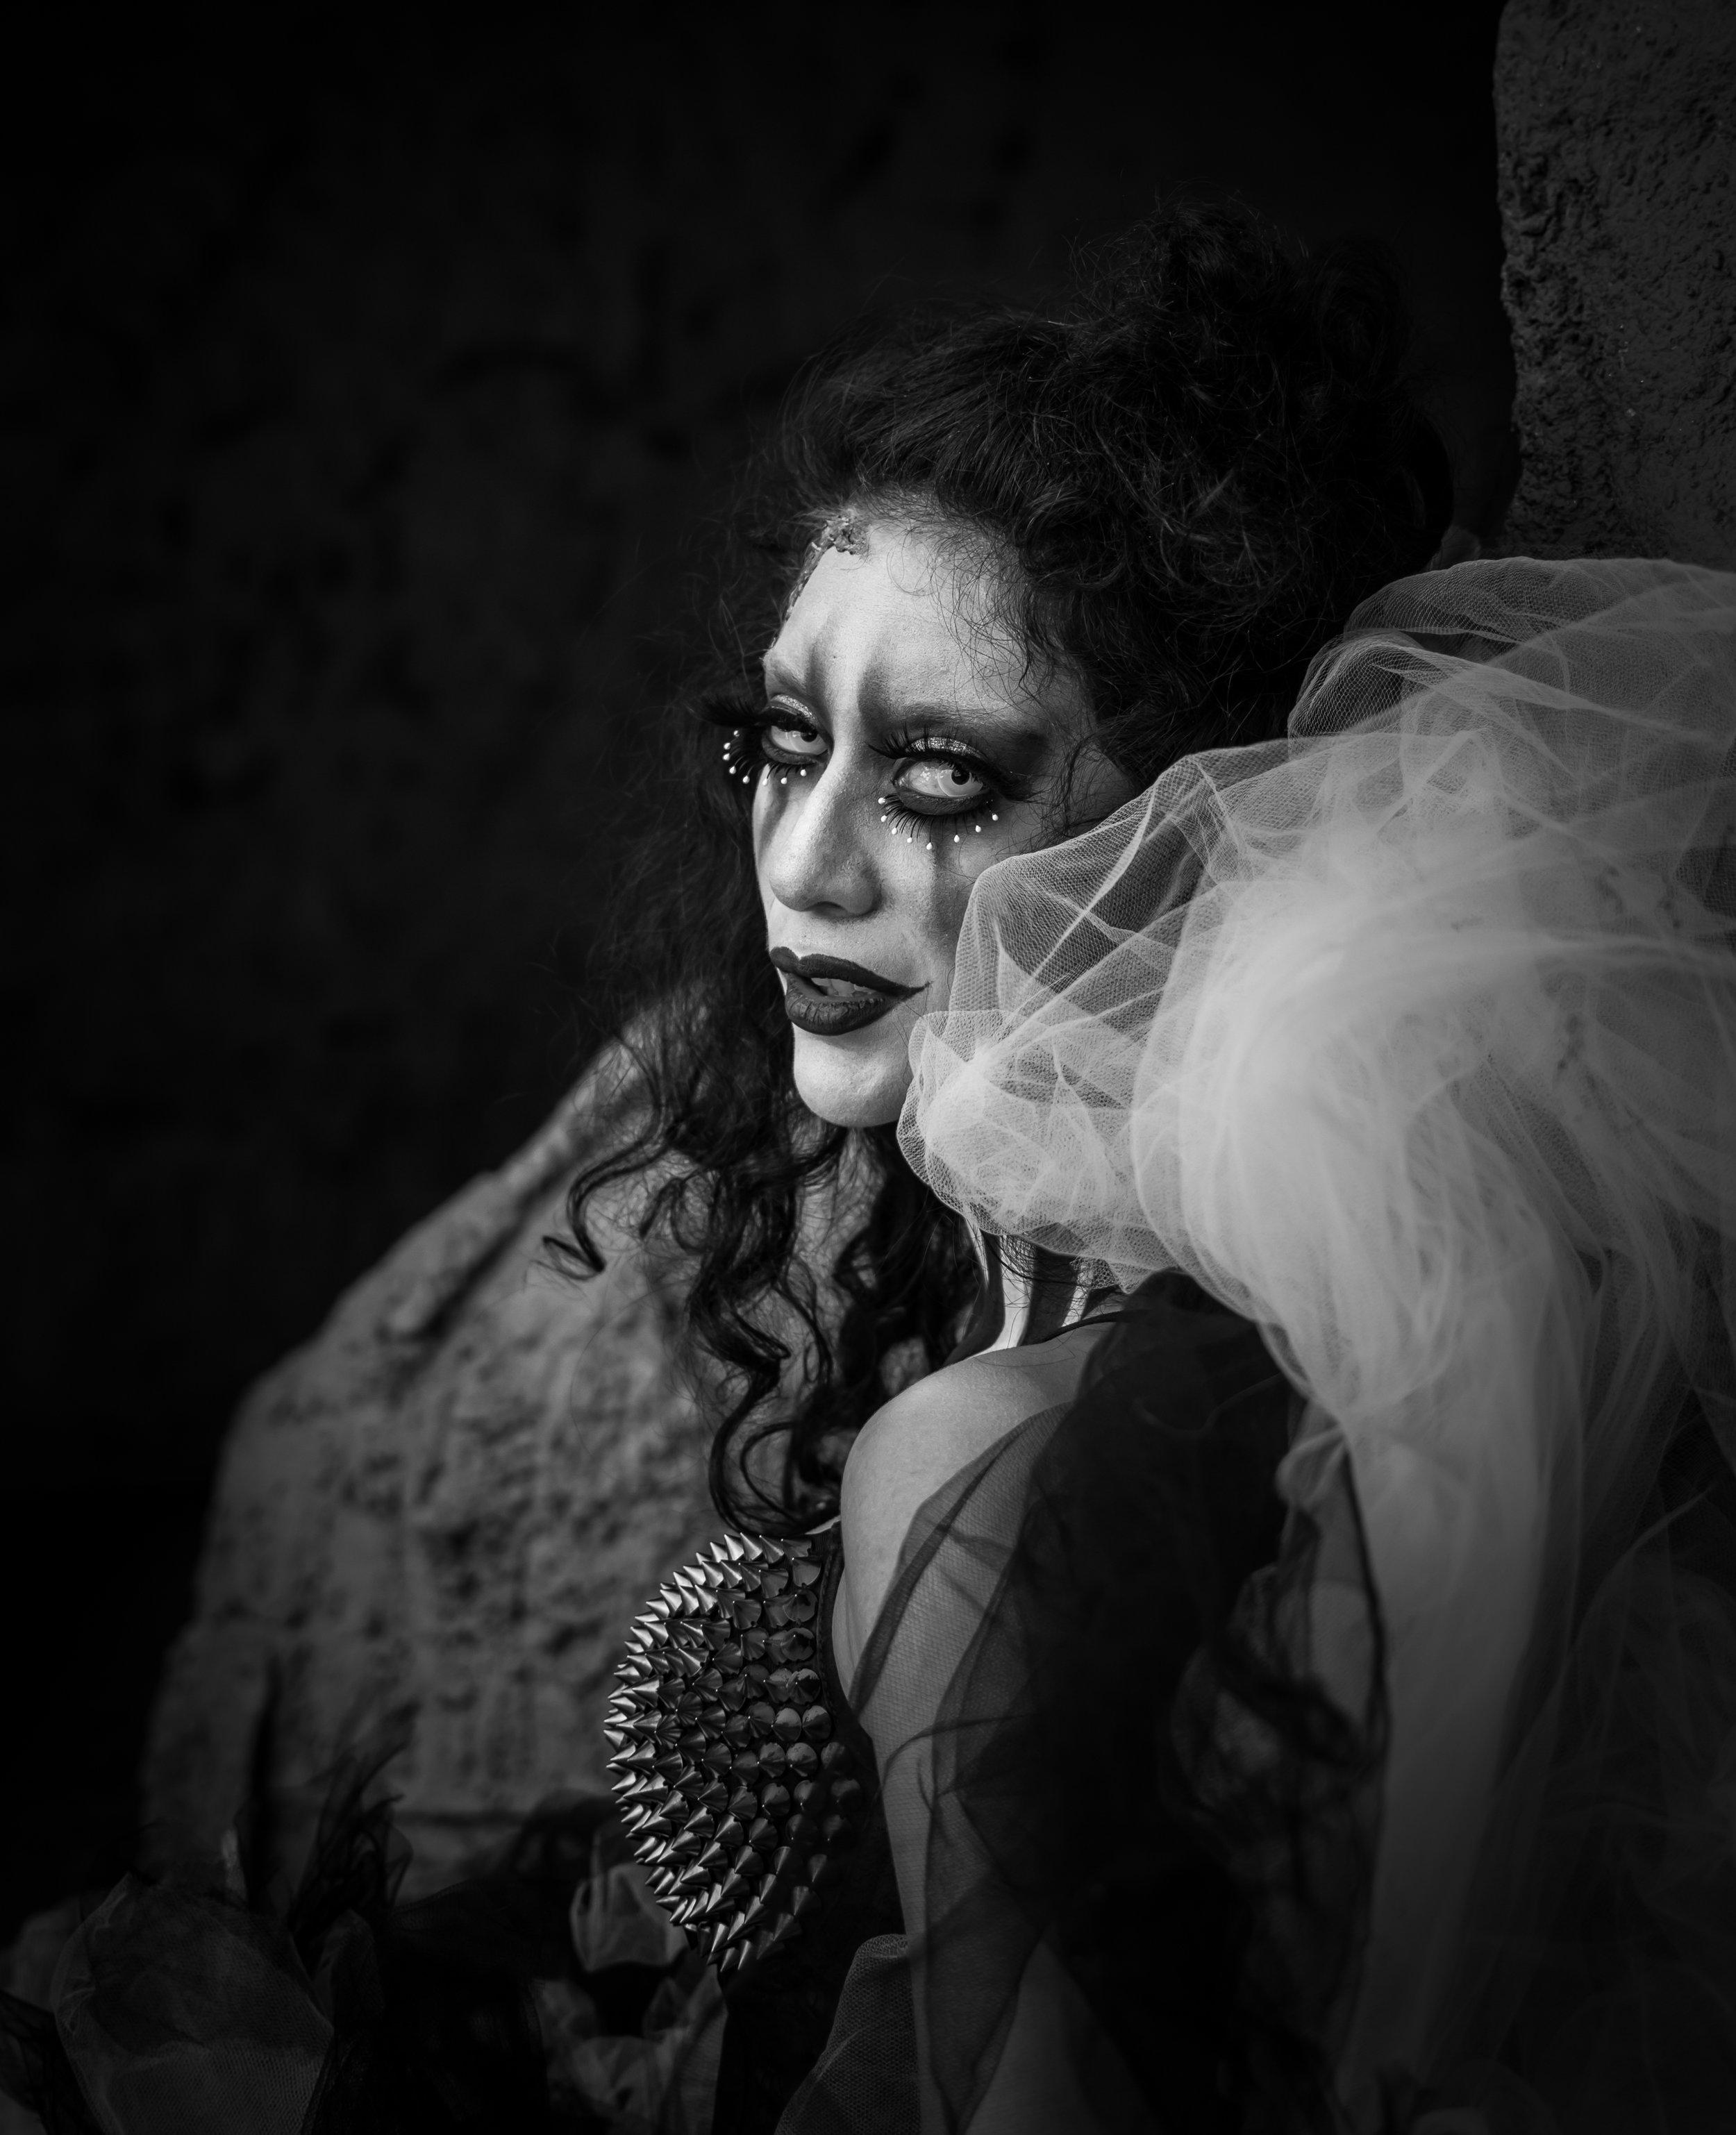 Carnival - Makeup by Faina